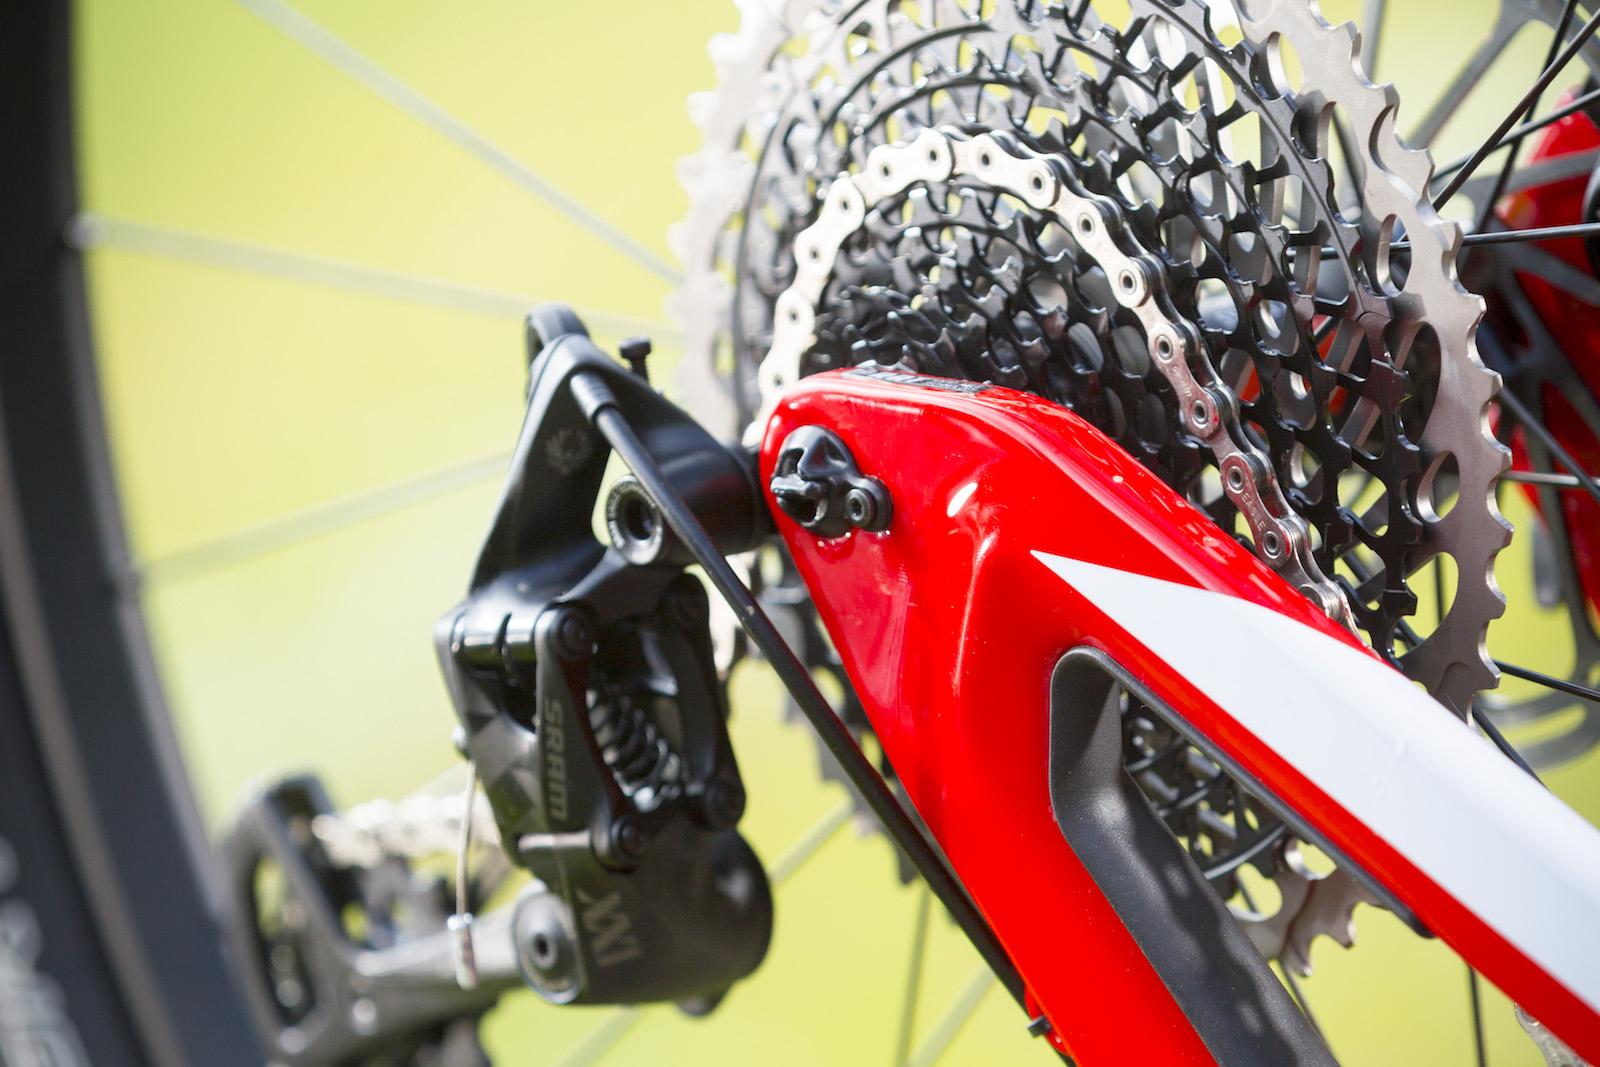 GD255837_Focus Morzine 2016 Bikes_One